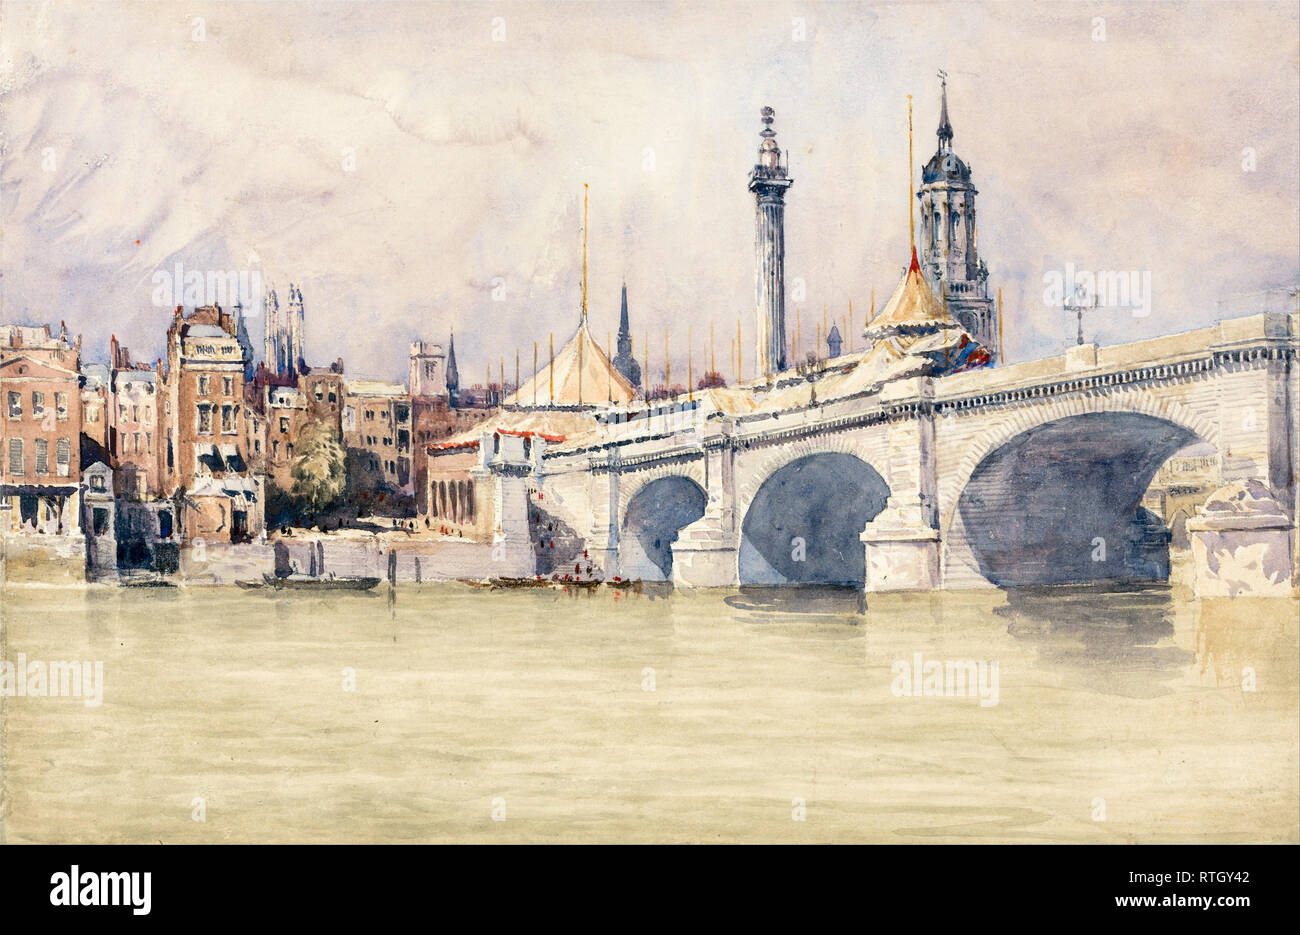 The Opening of the New London Bridge, painting, 1831, David Cox - Stock Image